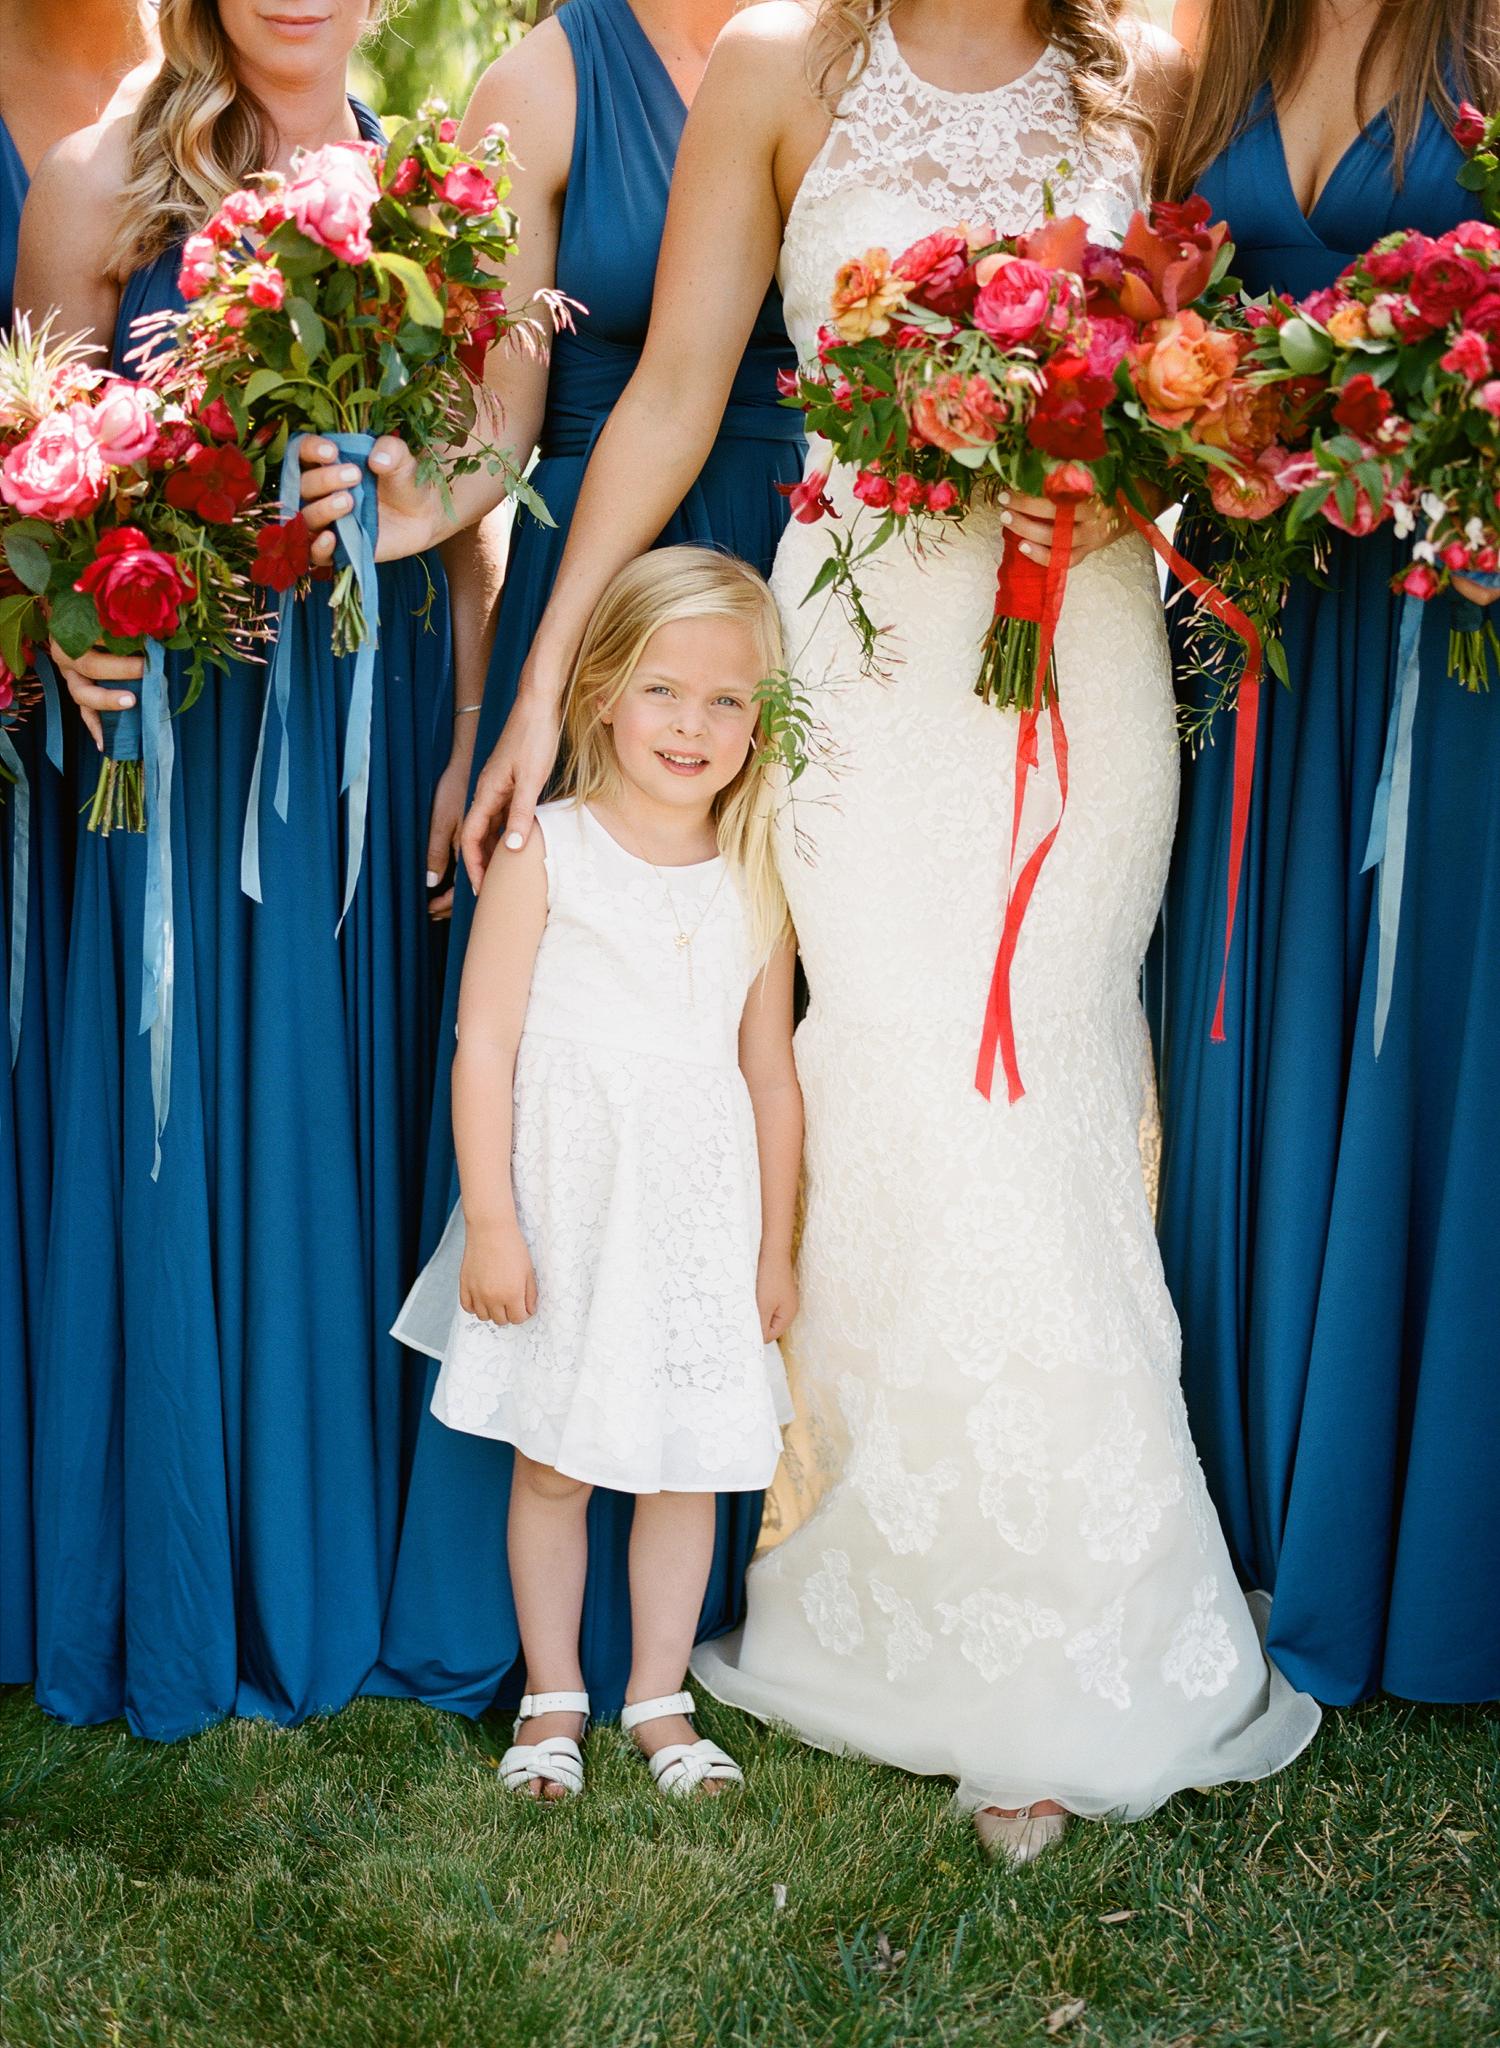 6-blue-bridesmaid-dress.jpg